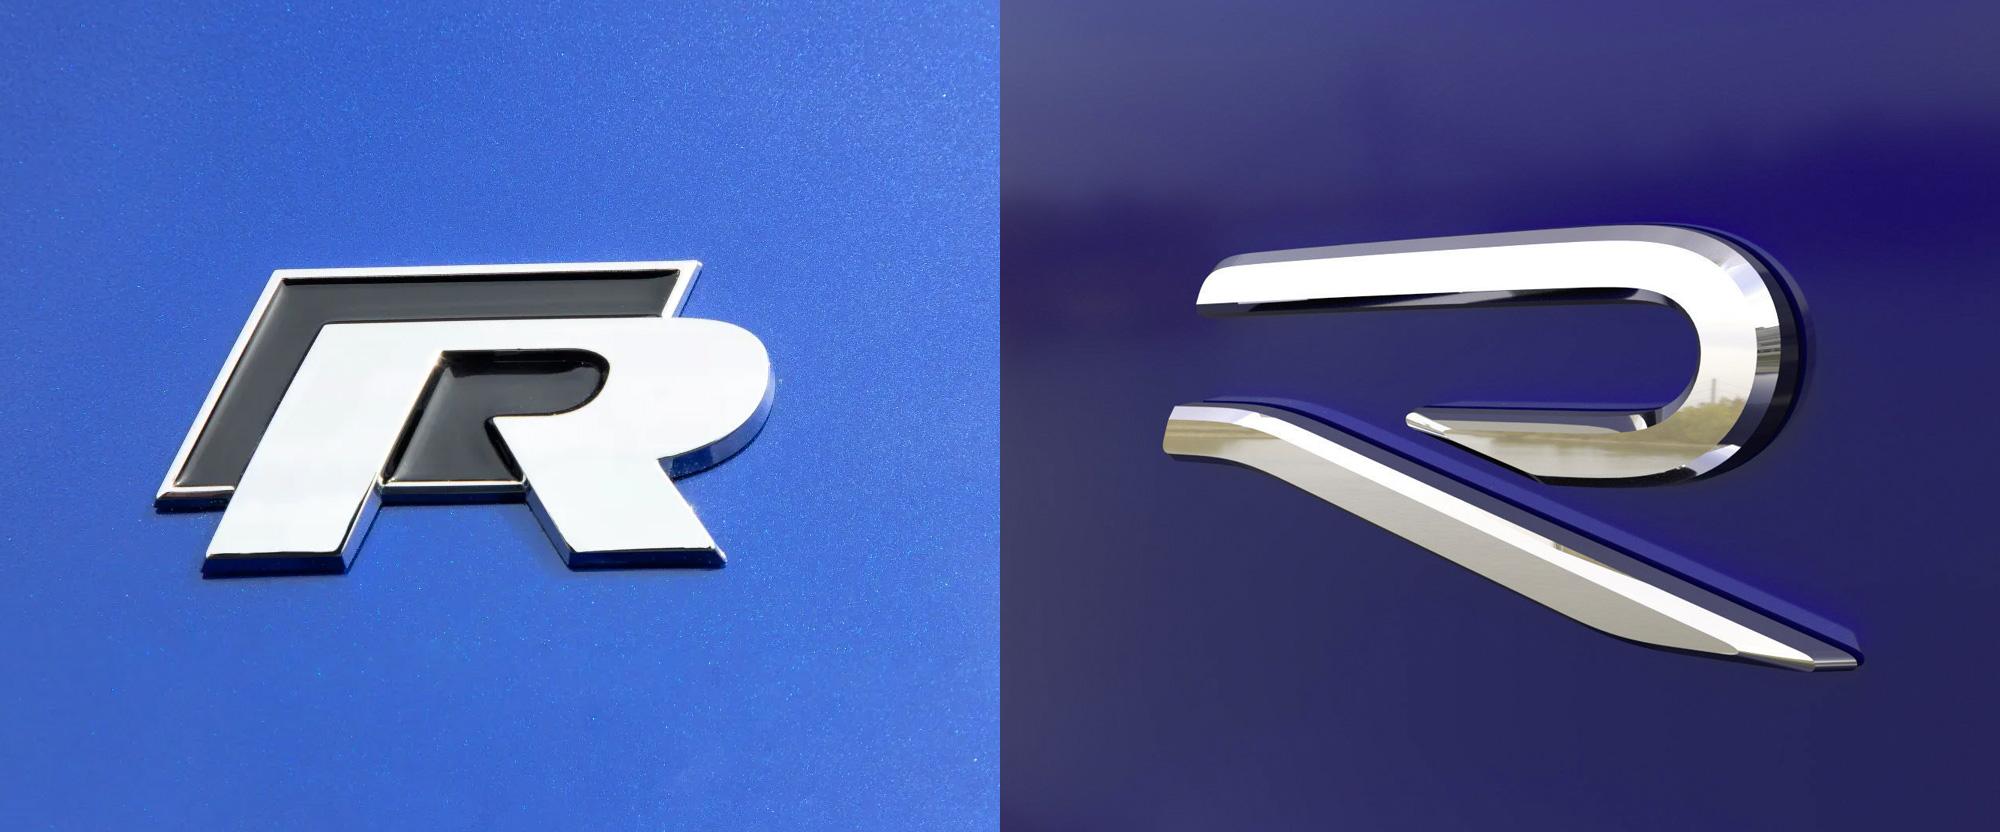 Изменение логотипа Volkswagen R